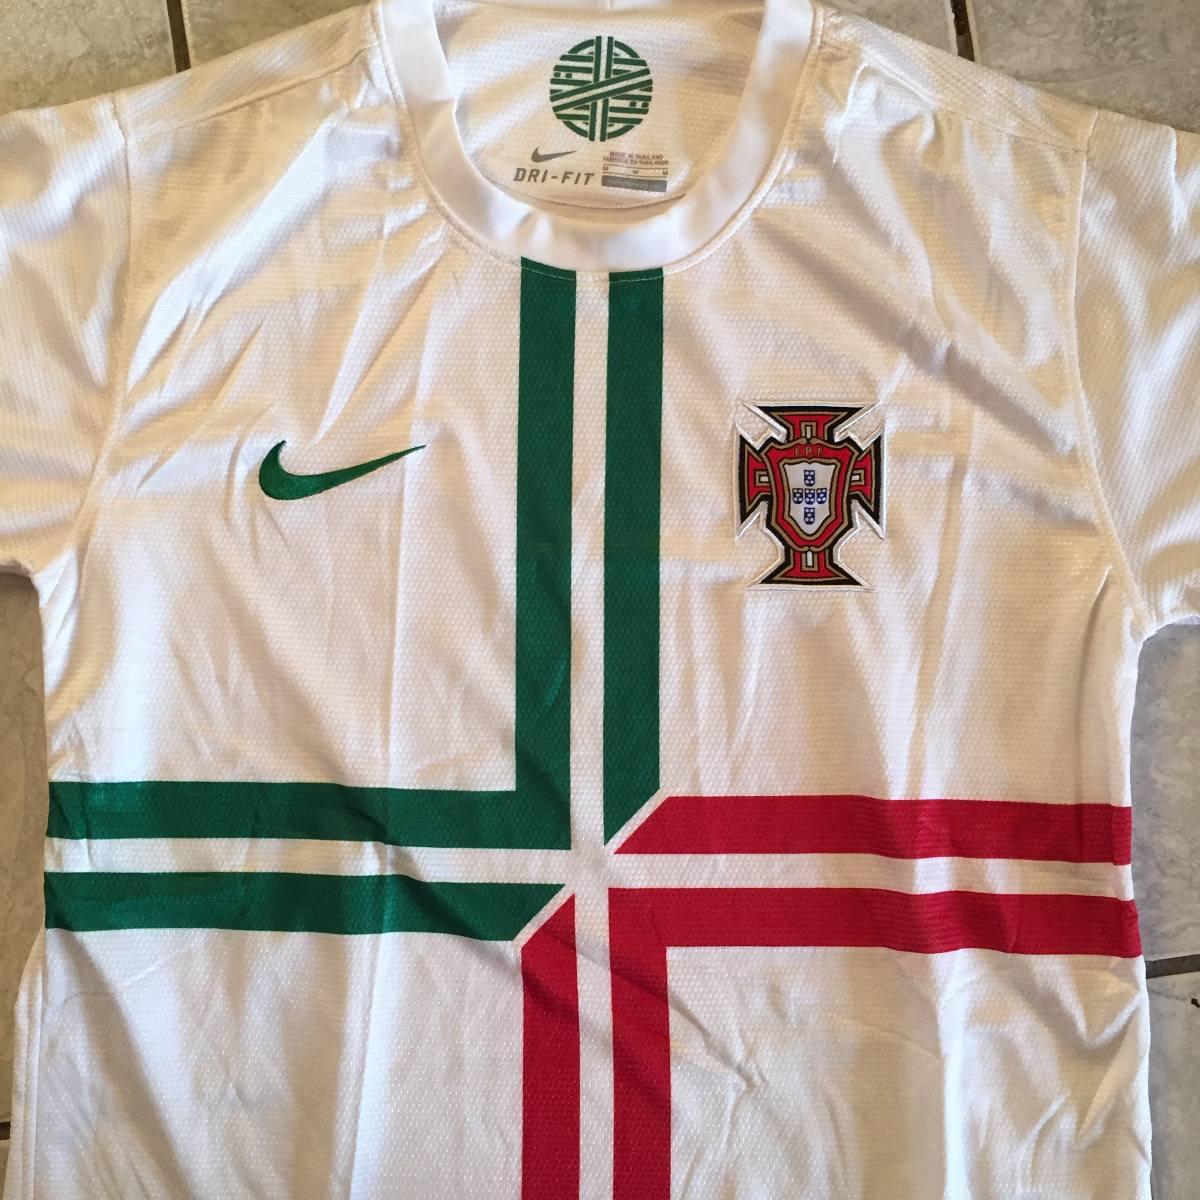 a8bf8675c6 camisa portugal branca 2015. Carregando zoom.